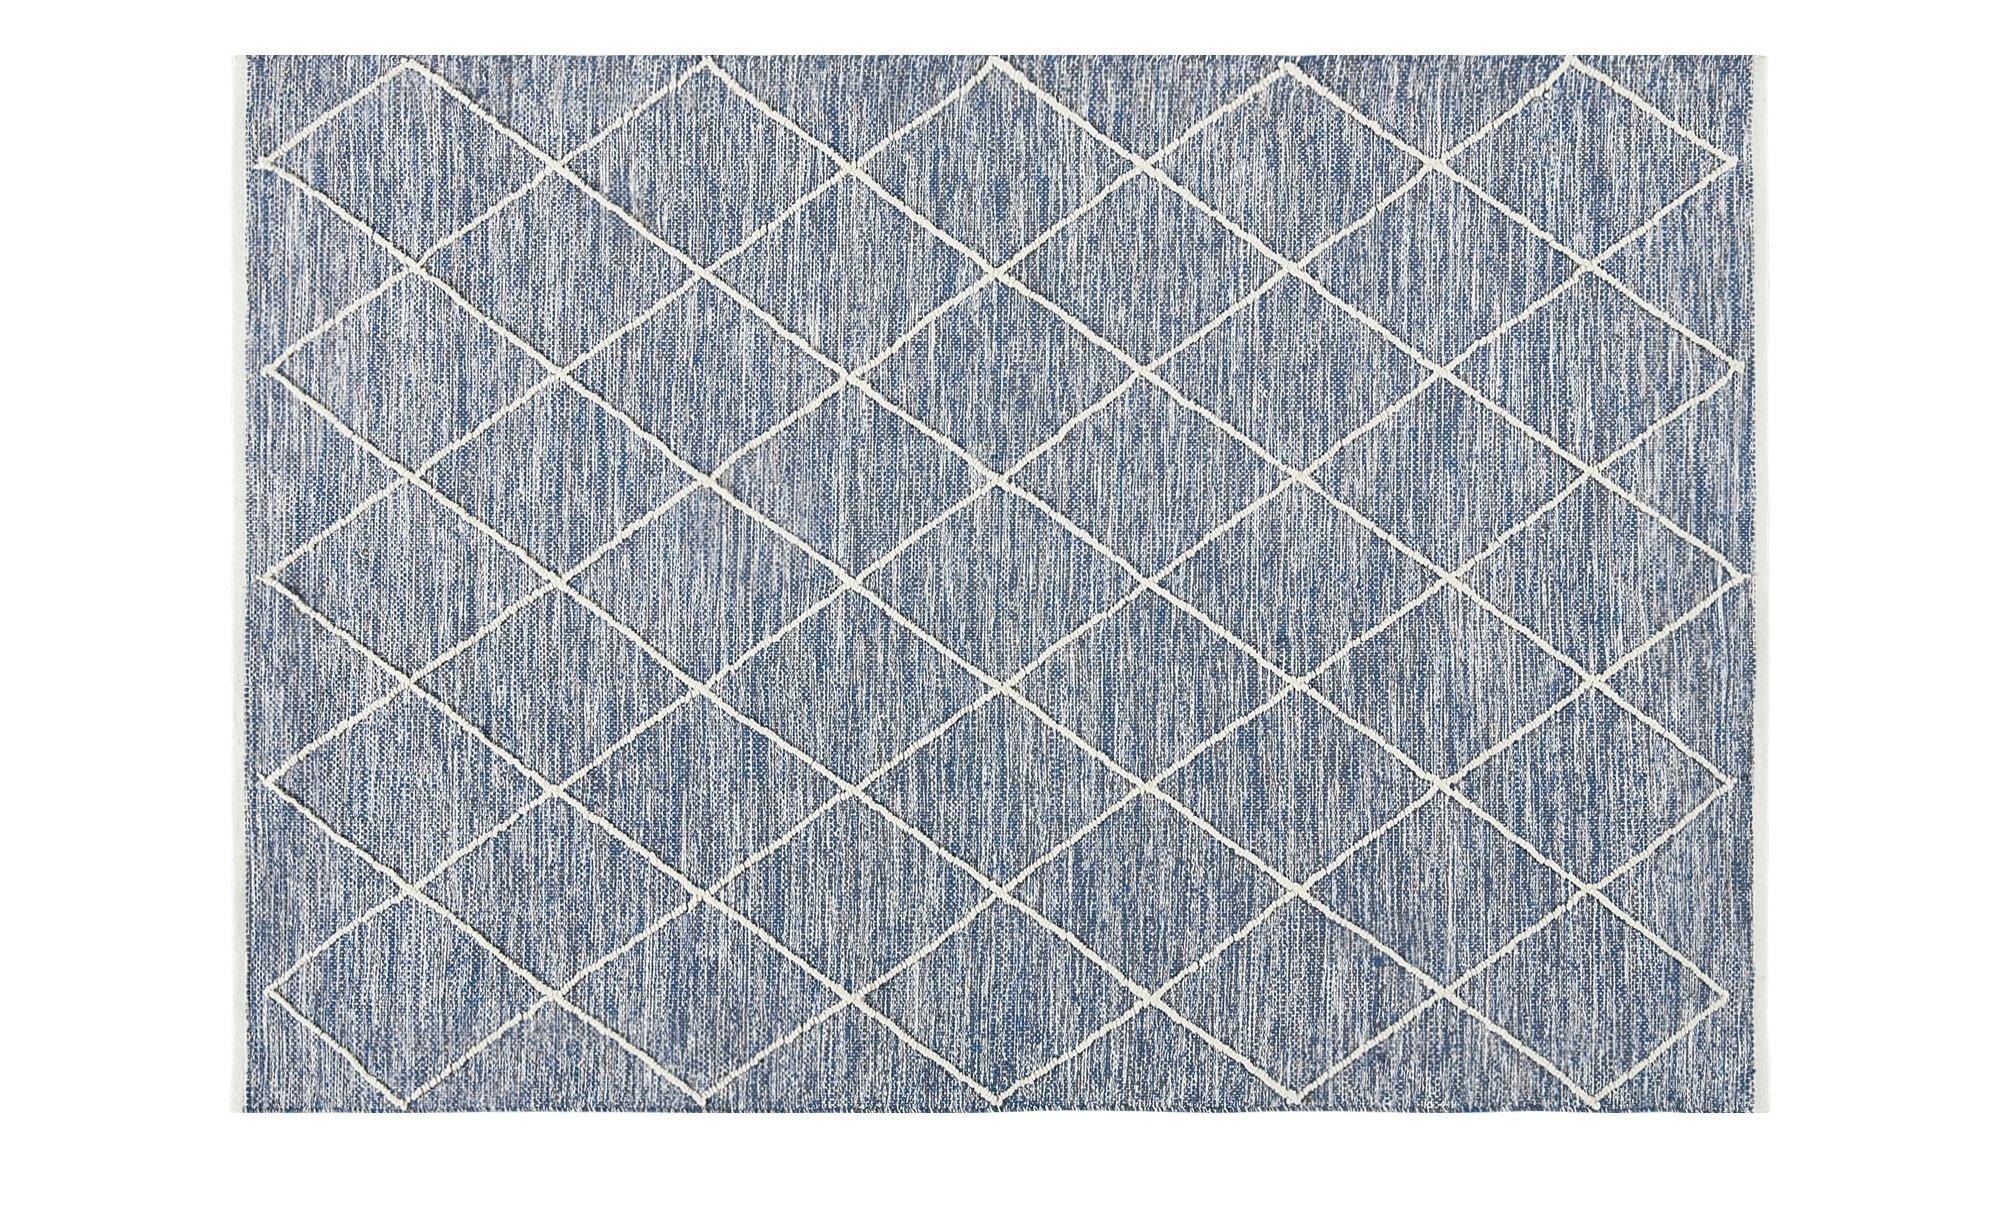 Handgewebter Naturteppich  Pantin ¦ blau ¦ Baumwolle, 100% Baumwolle ¦ Maße (cm): B: 140 Teppiche > Wohnteppiche > Naturteppiche - Höffner